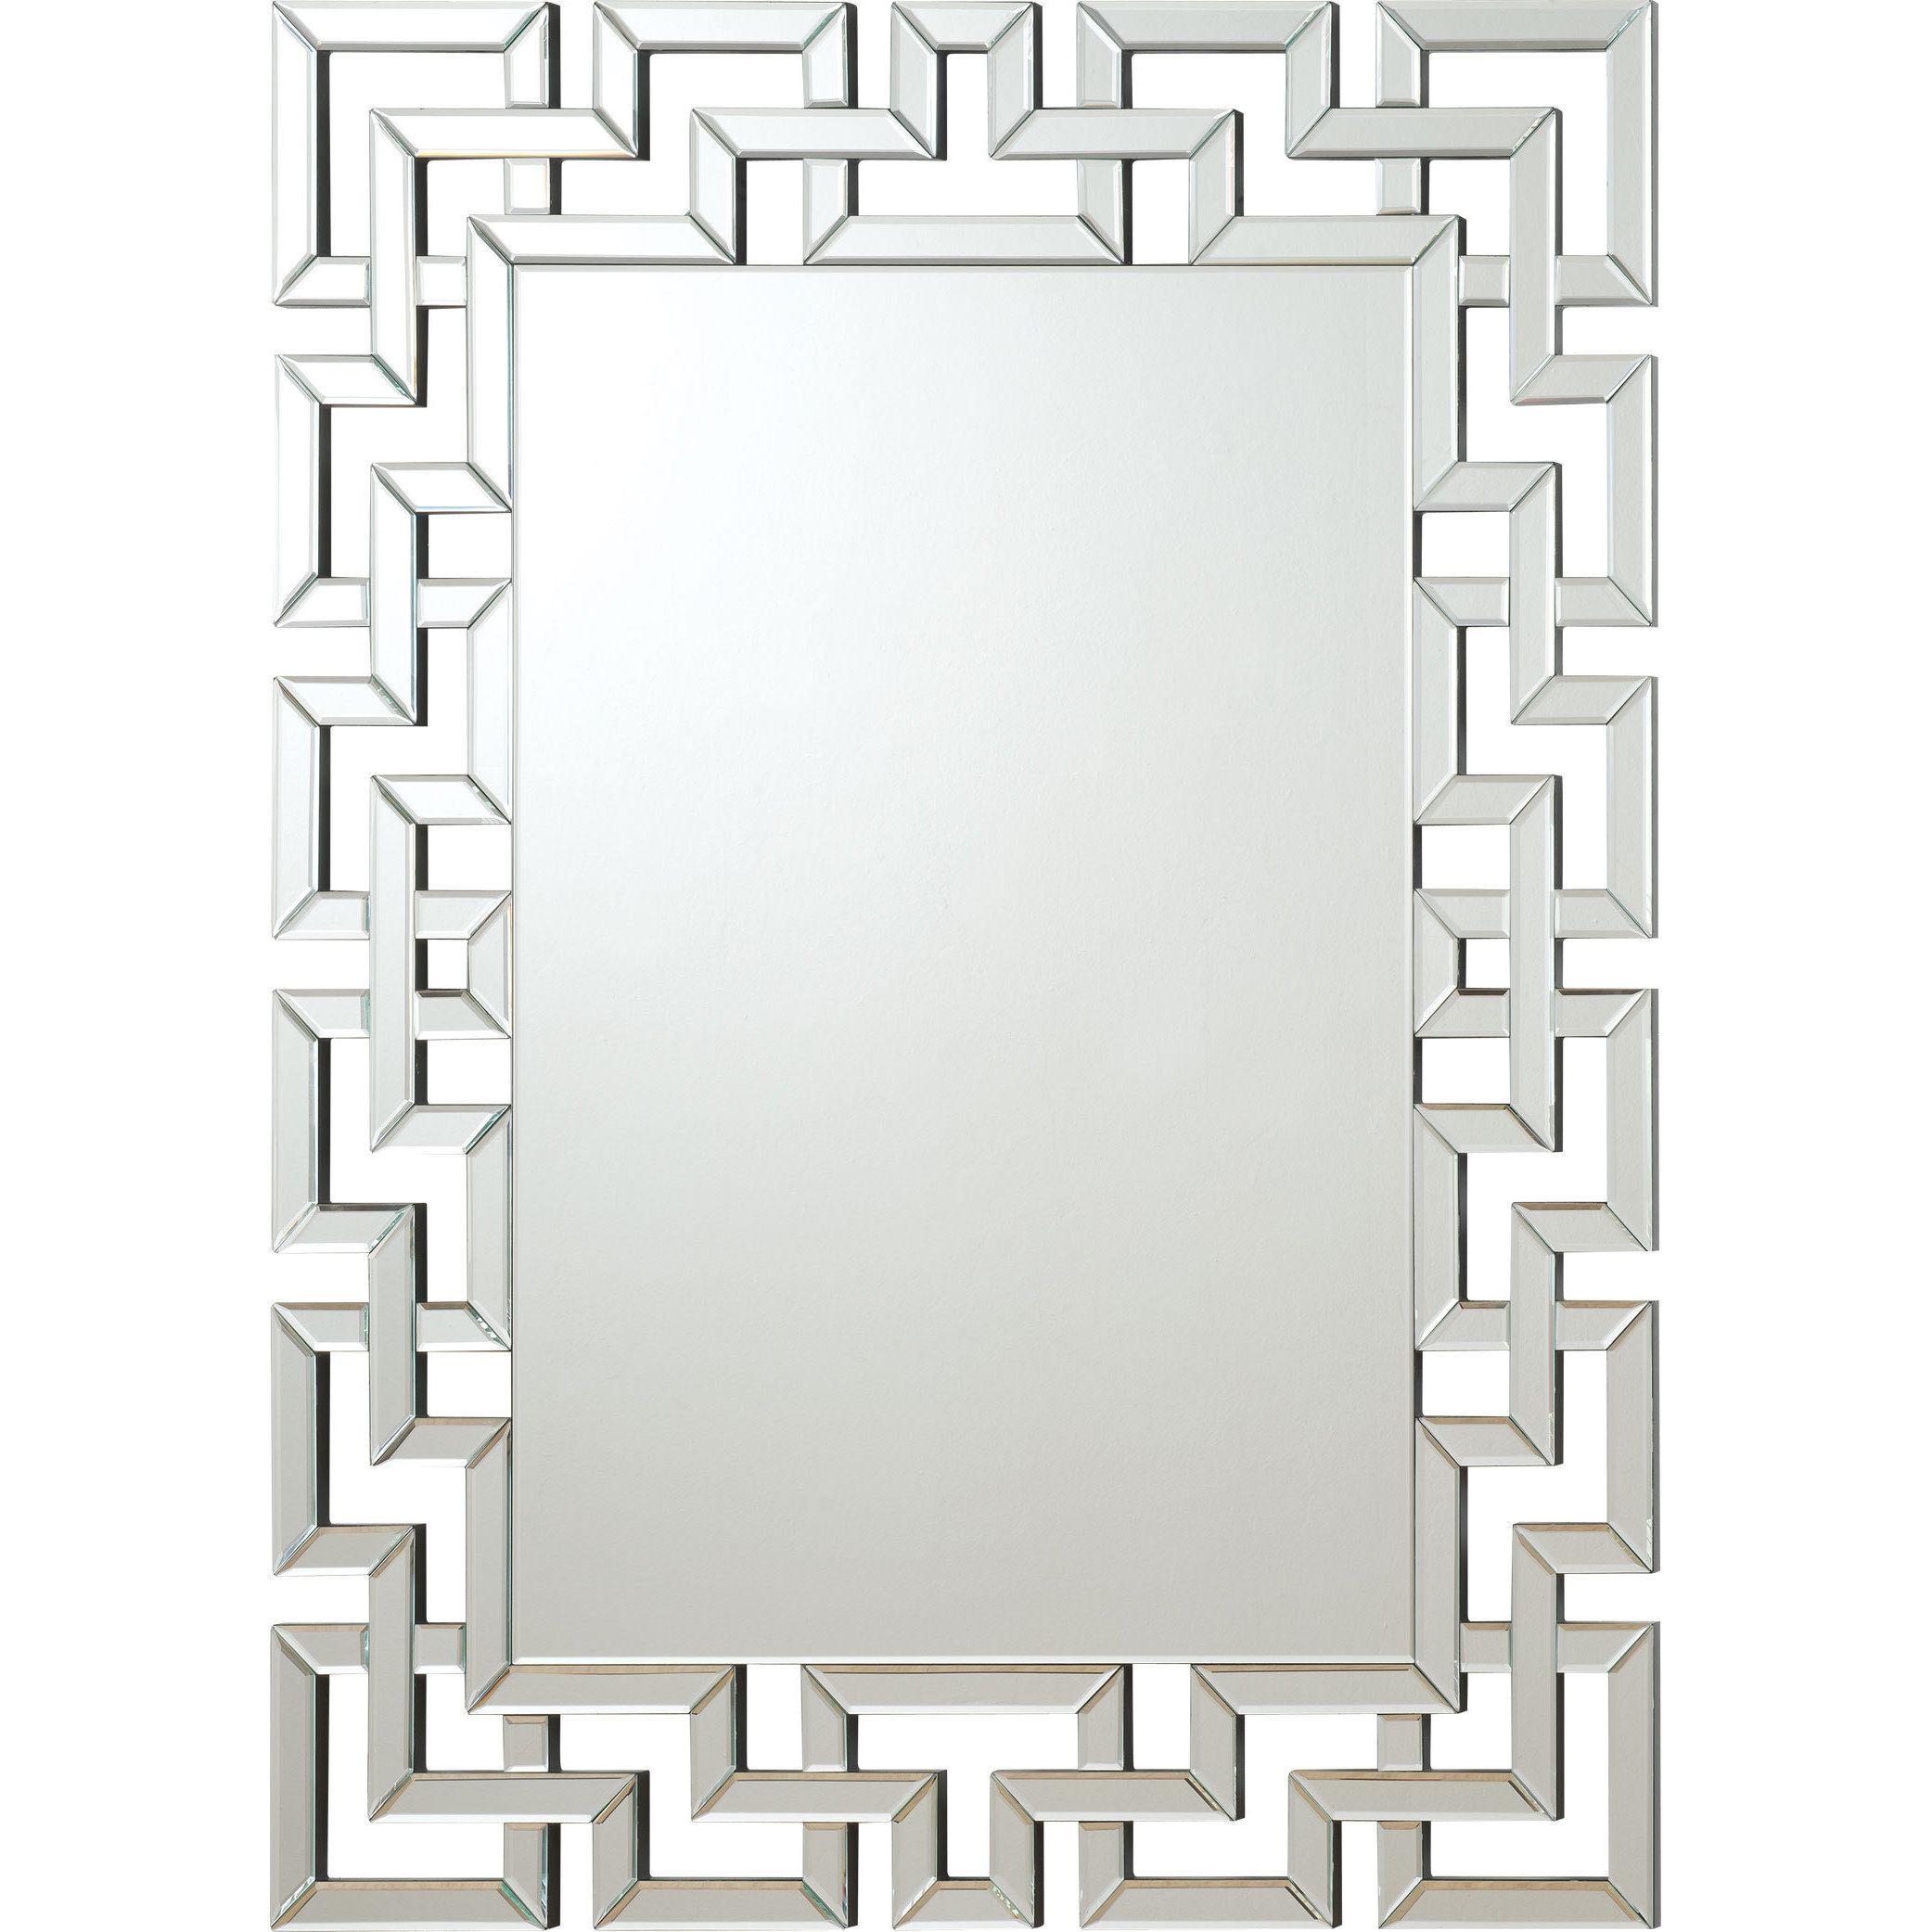 Coaster company greek key silver interlocking frameless mirror coaster company greek key silver interlocking frameless mirror silver jeuxipadfo Choice Image